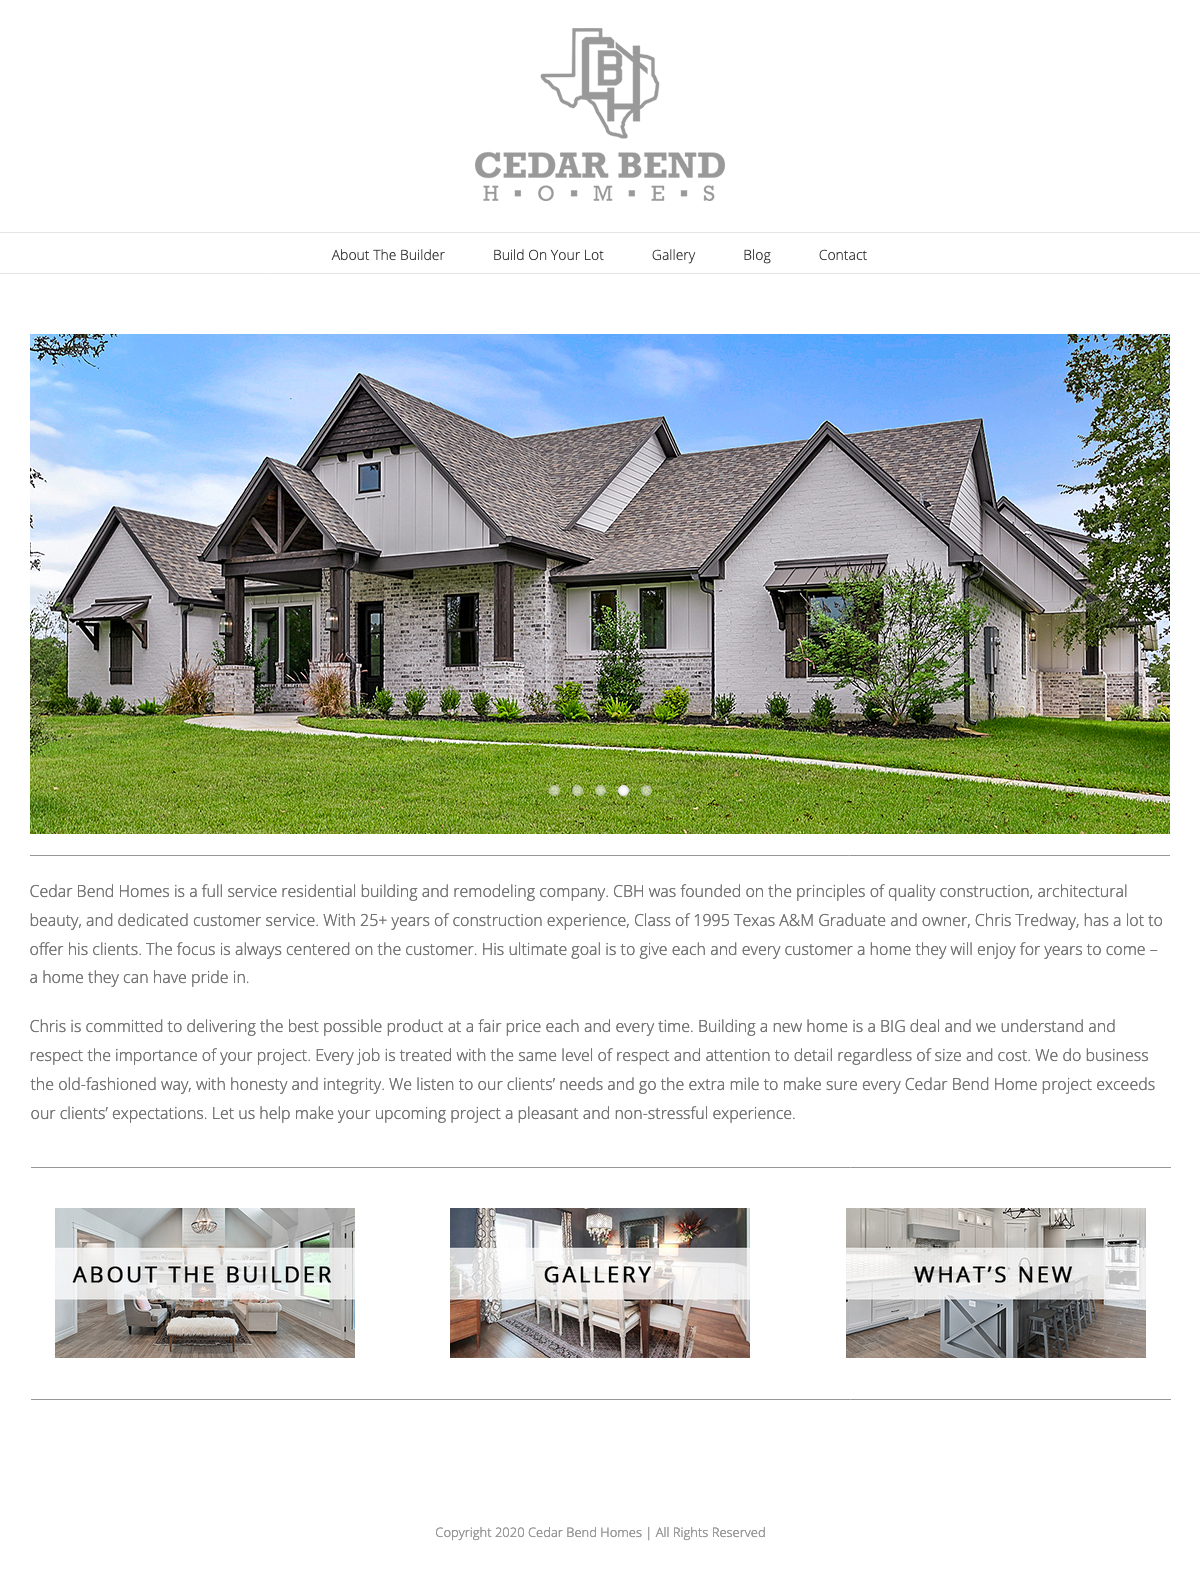 CBH New Website